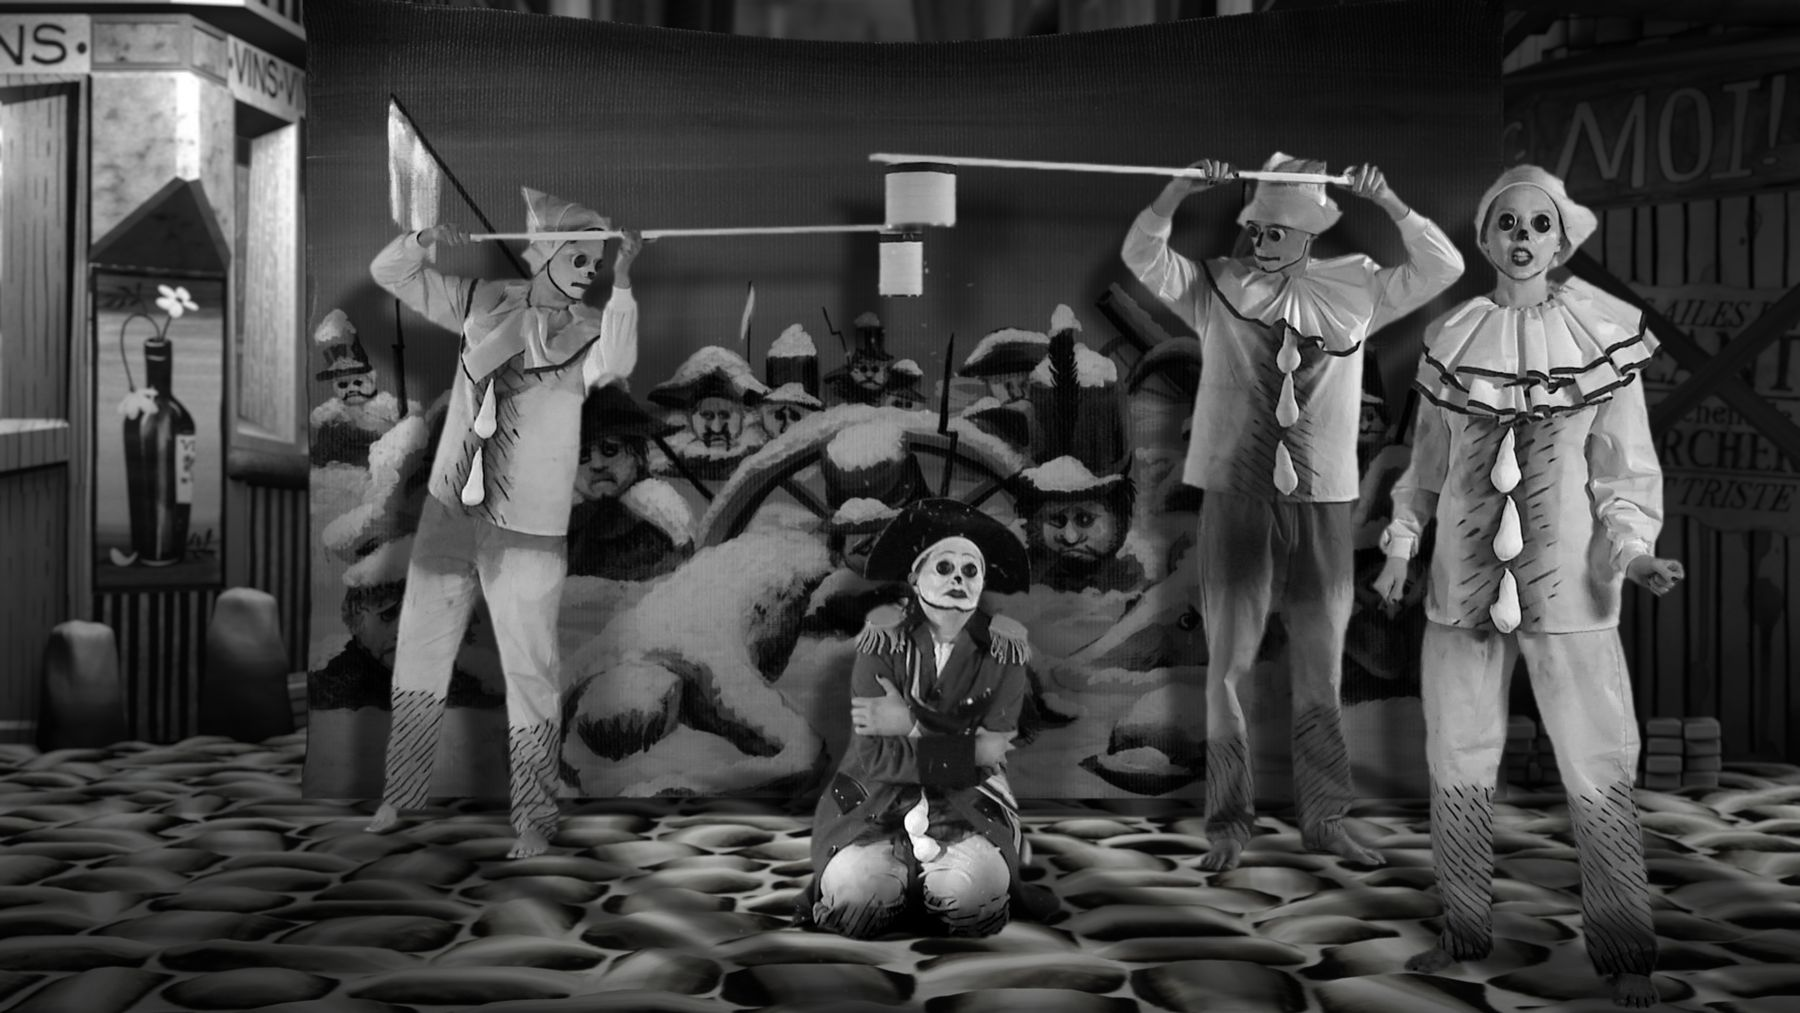 MARY REID KELLEY with PATRICK KELLEY, Film Still fromThe Syphilis of Sisyphus, 2011